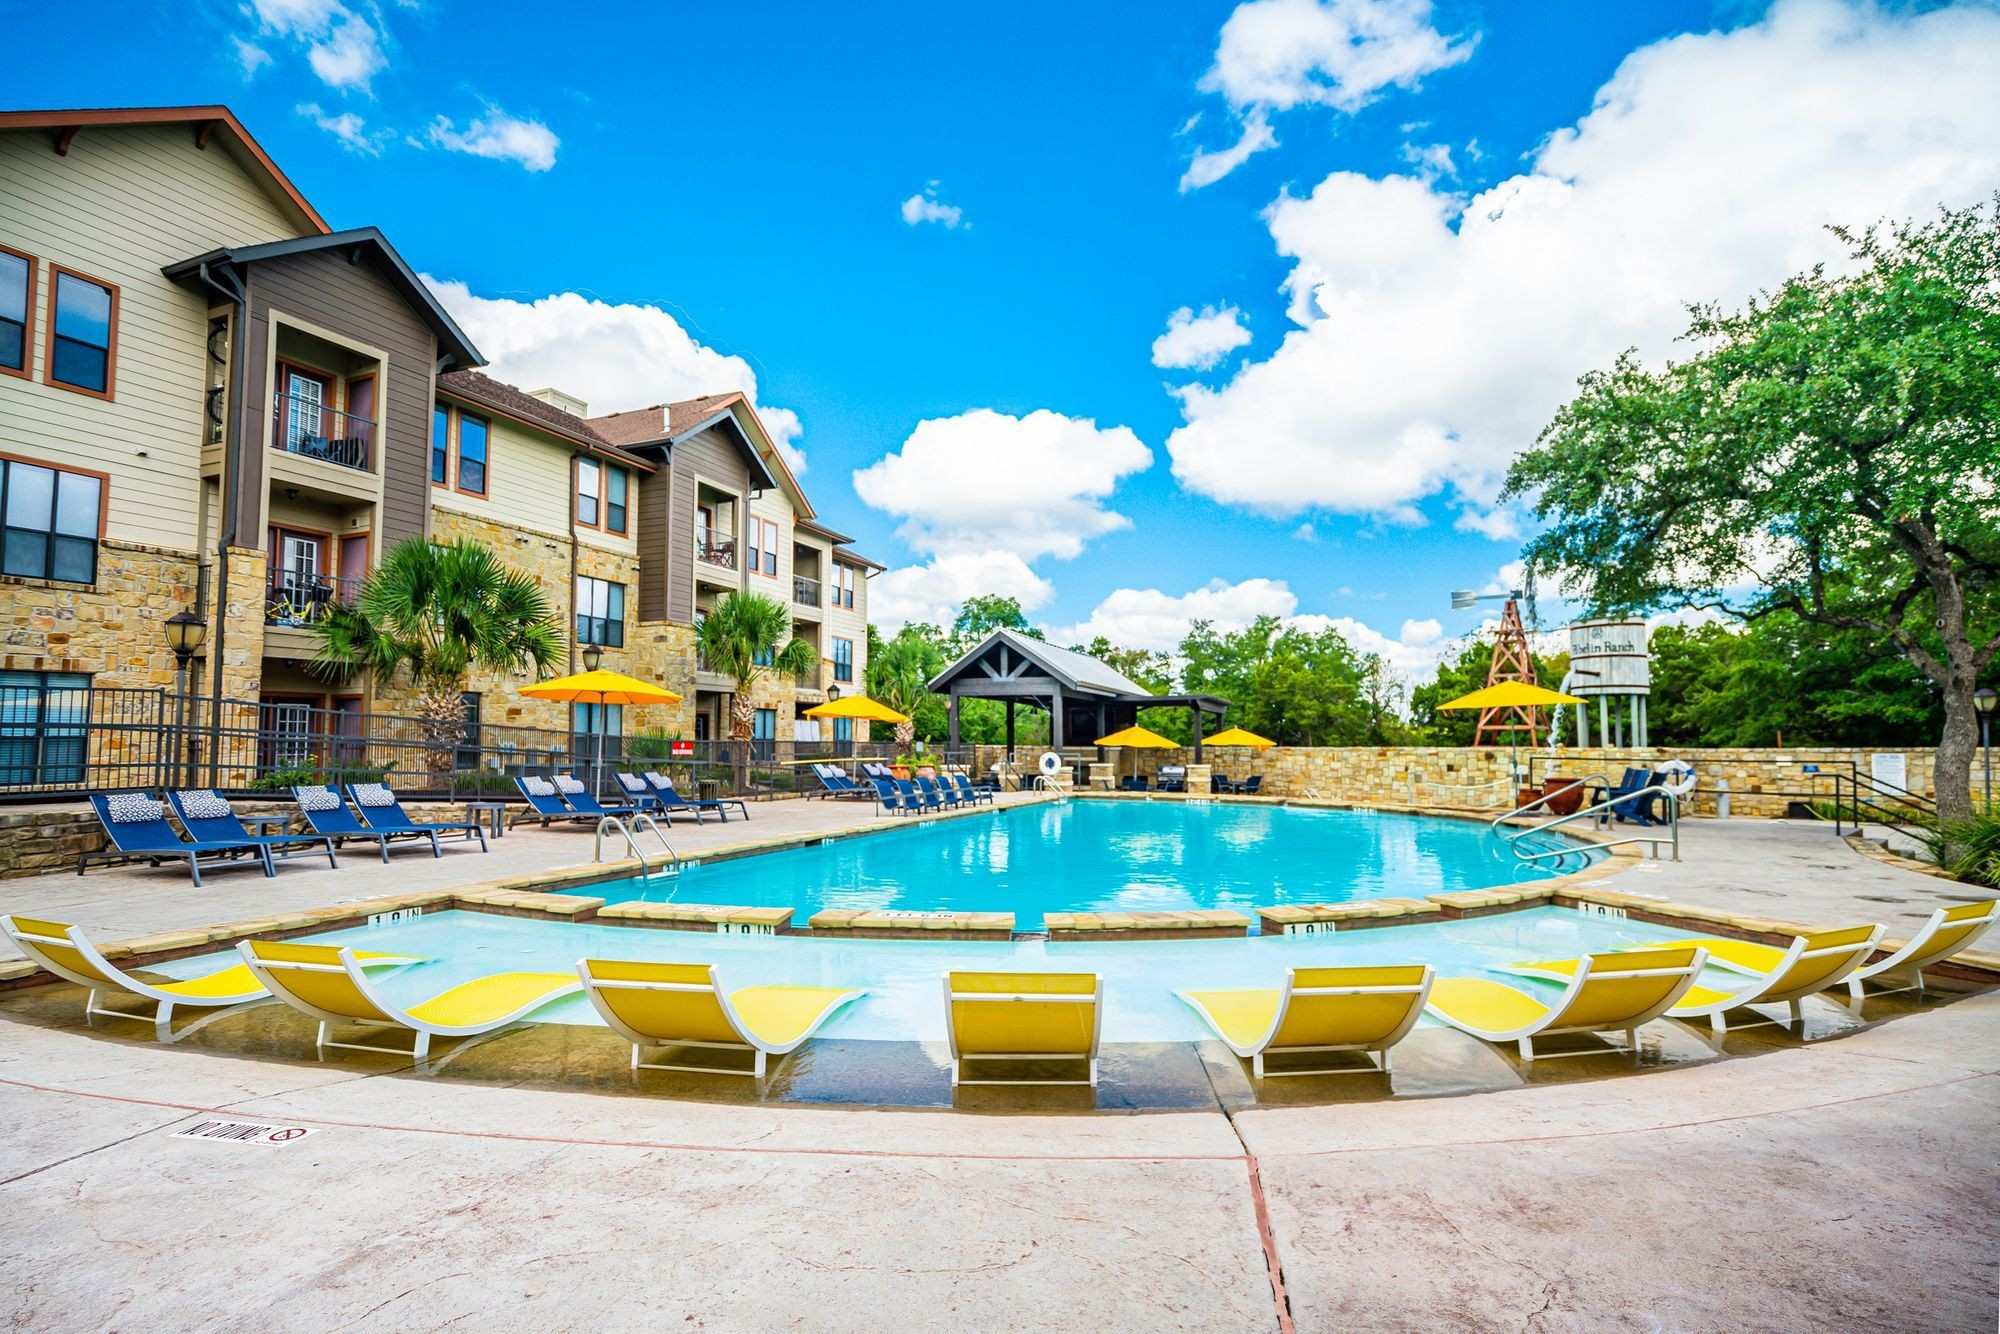 Apartments Near UT Austin The Asten at Ribelin Ranch for University of Texas - Austin Students in Austin, TX